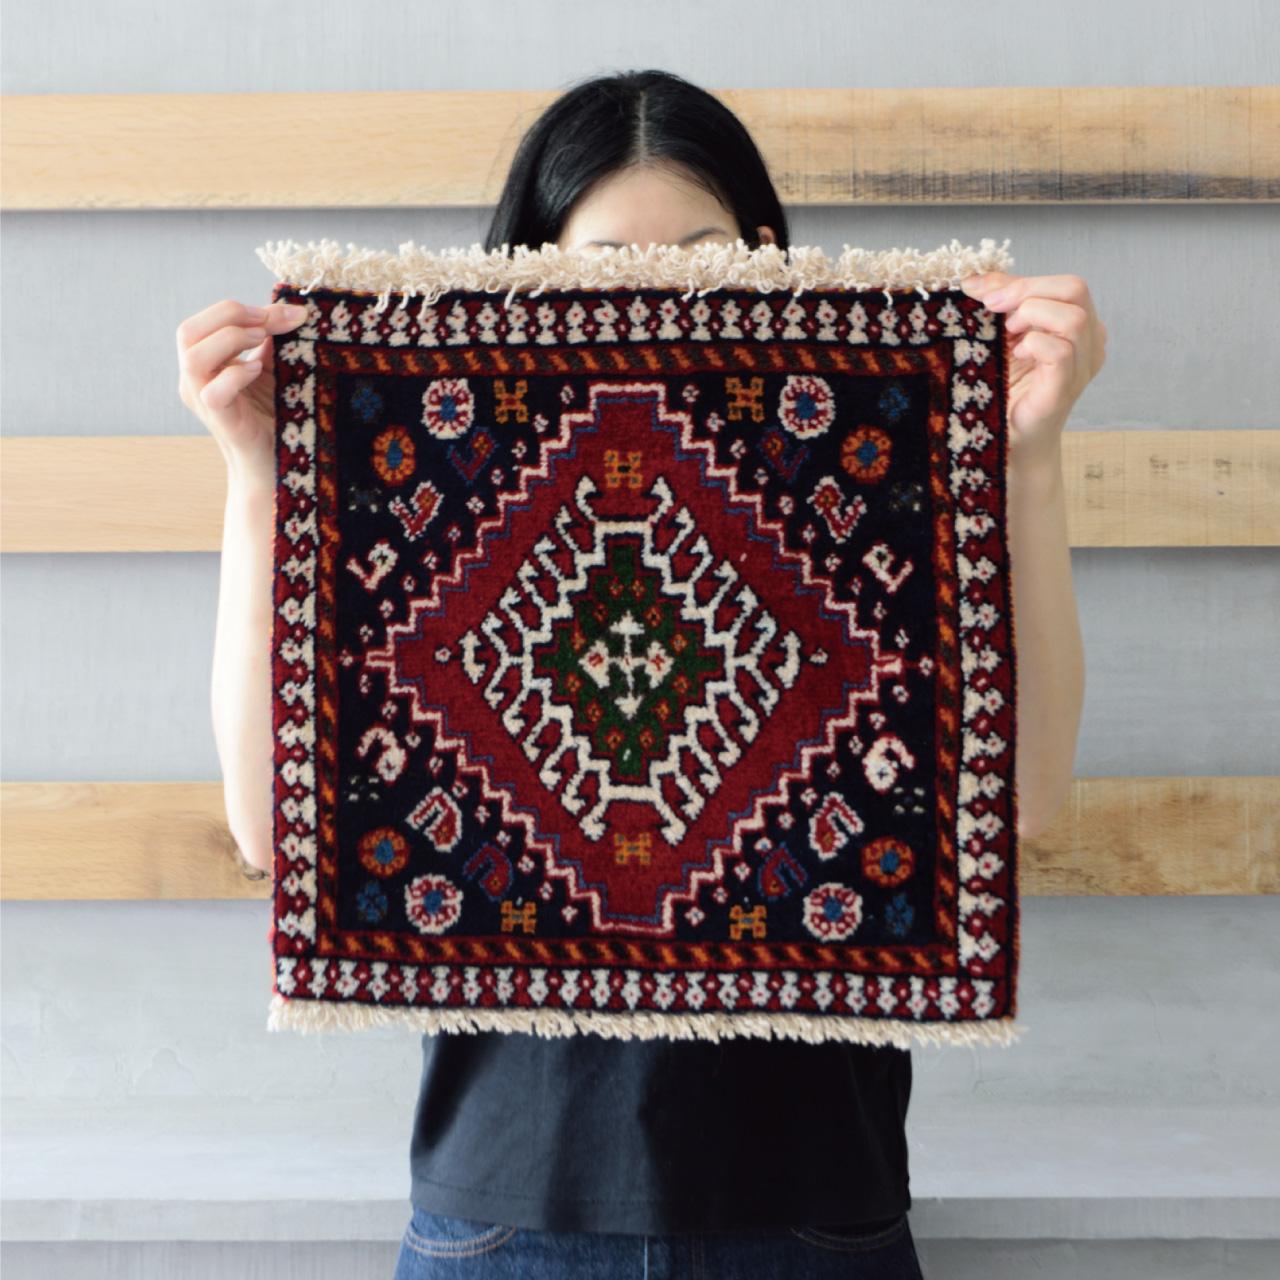 Tribal rug #71355 / 40×40cm / ヤラメ族 / ¥16,000-(税別)